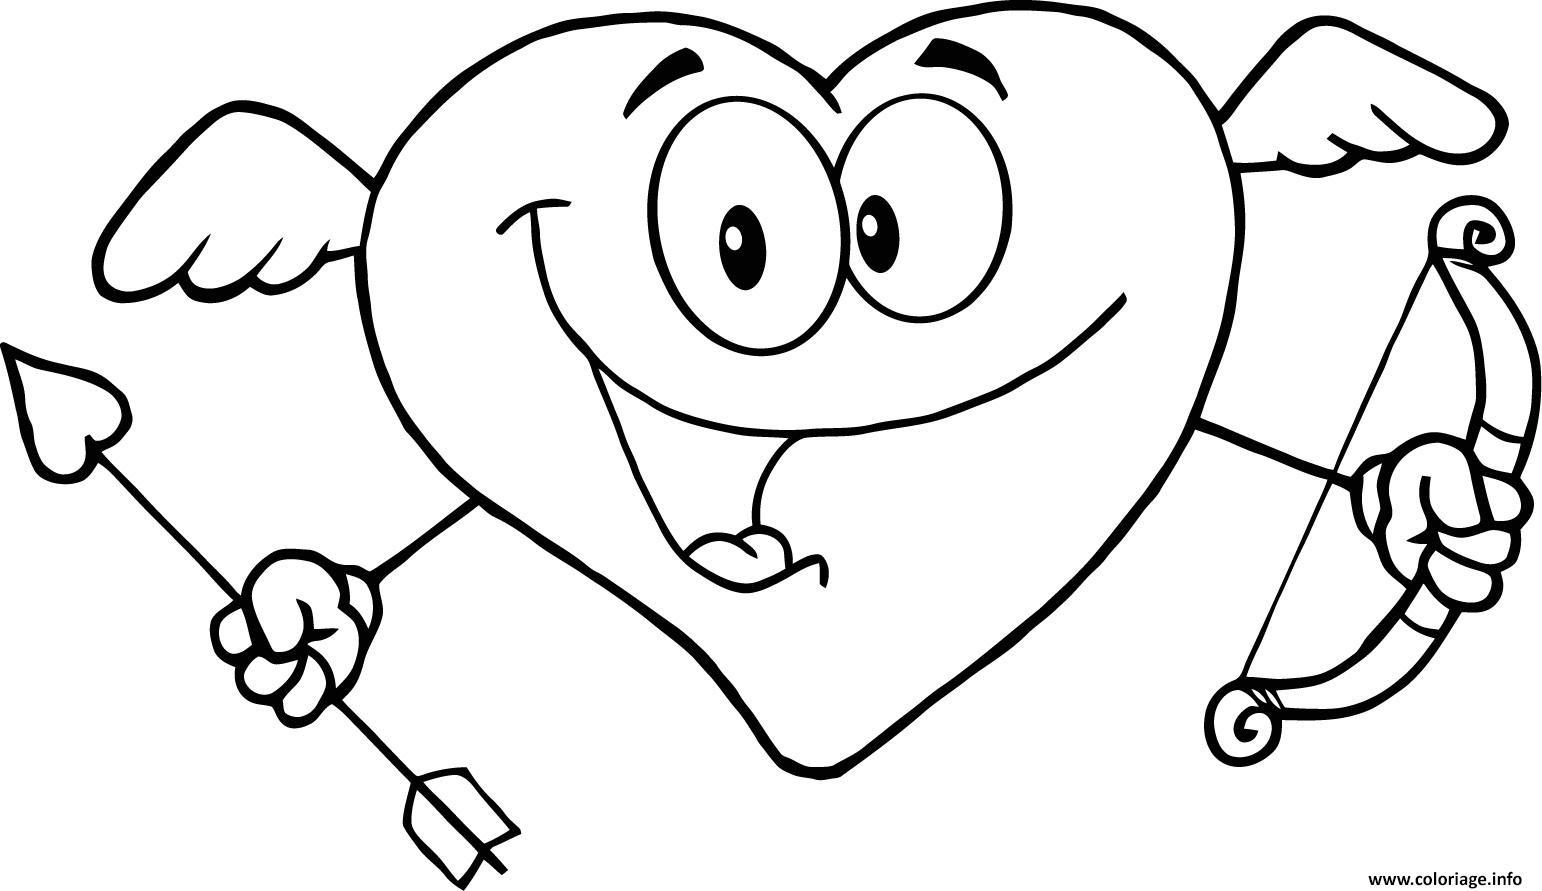 Coloriage Coeur Saint Valentin 138 Dessin  Imprimer